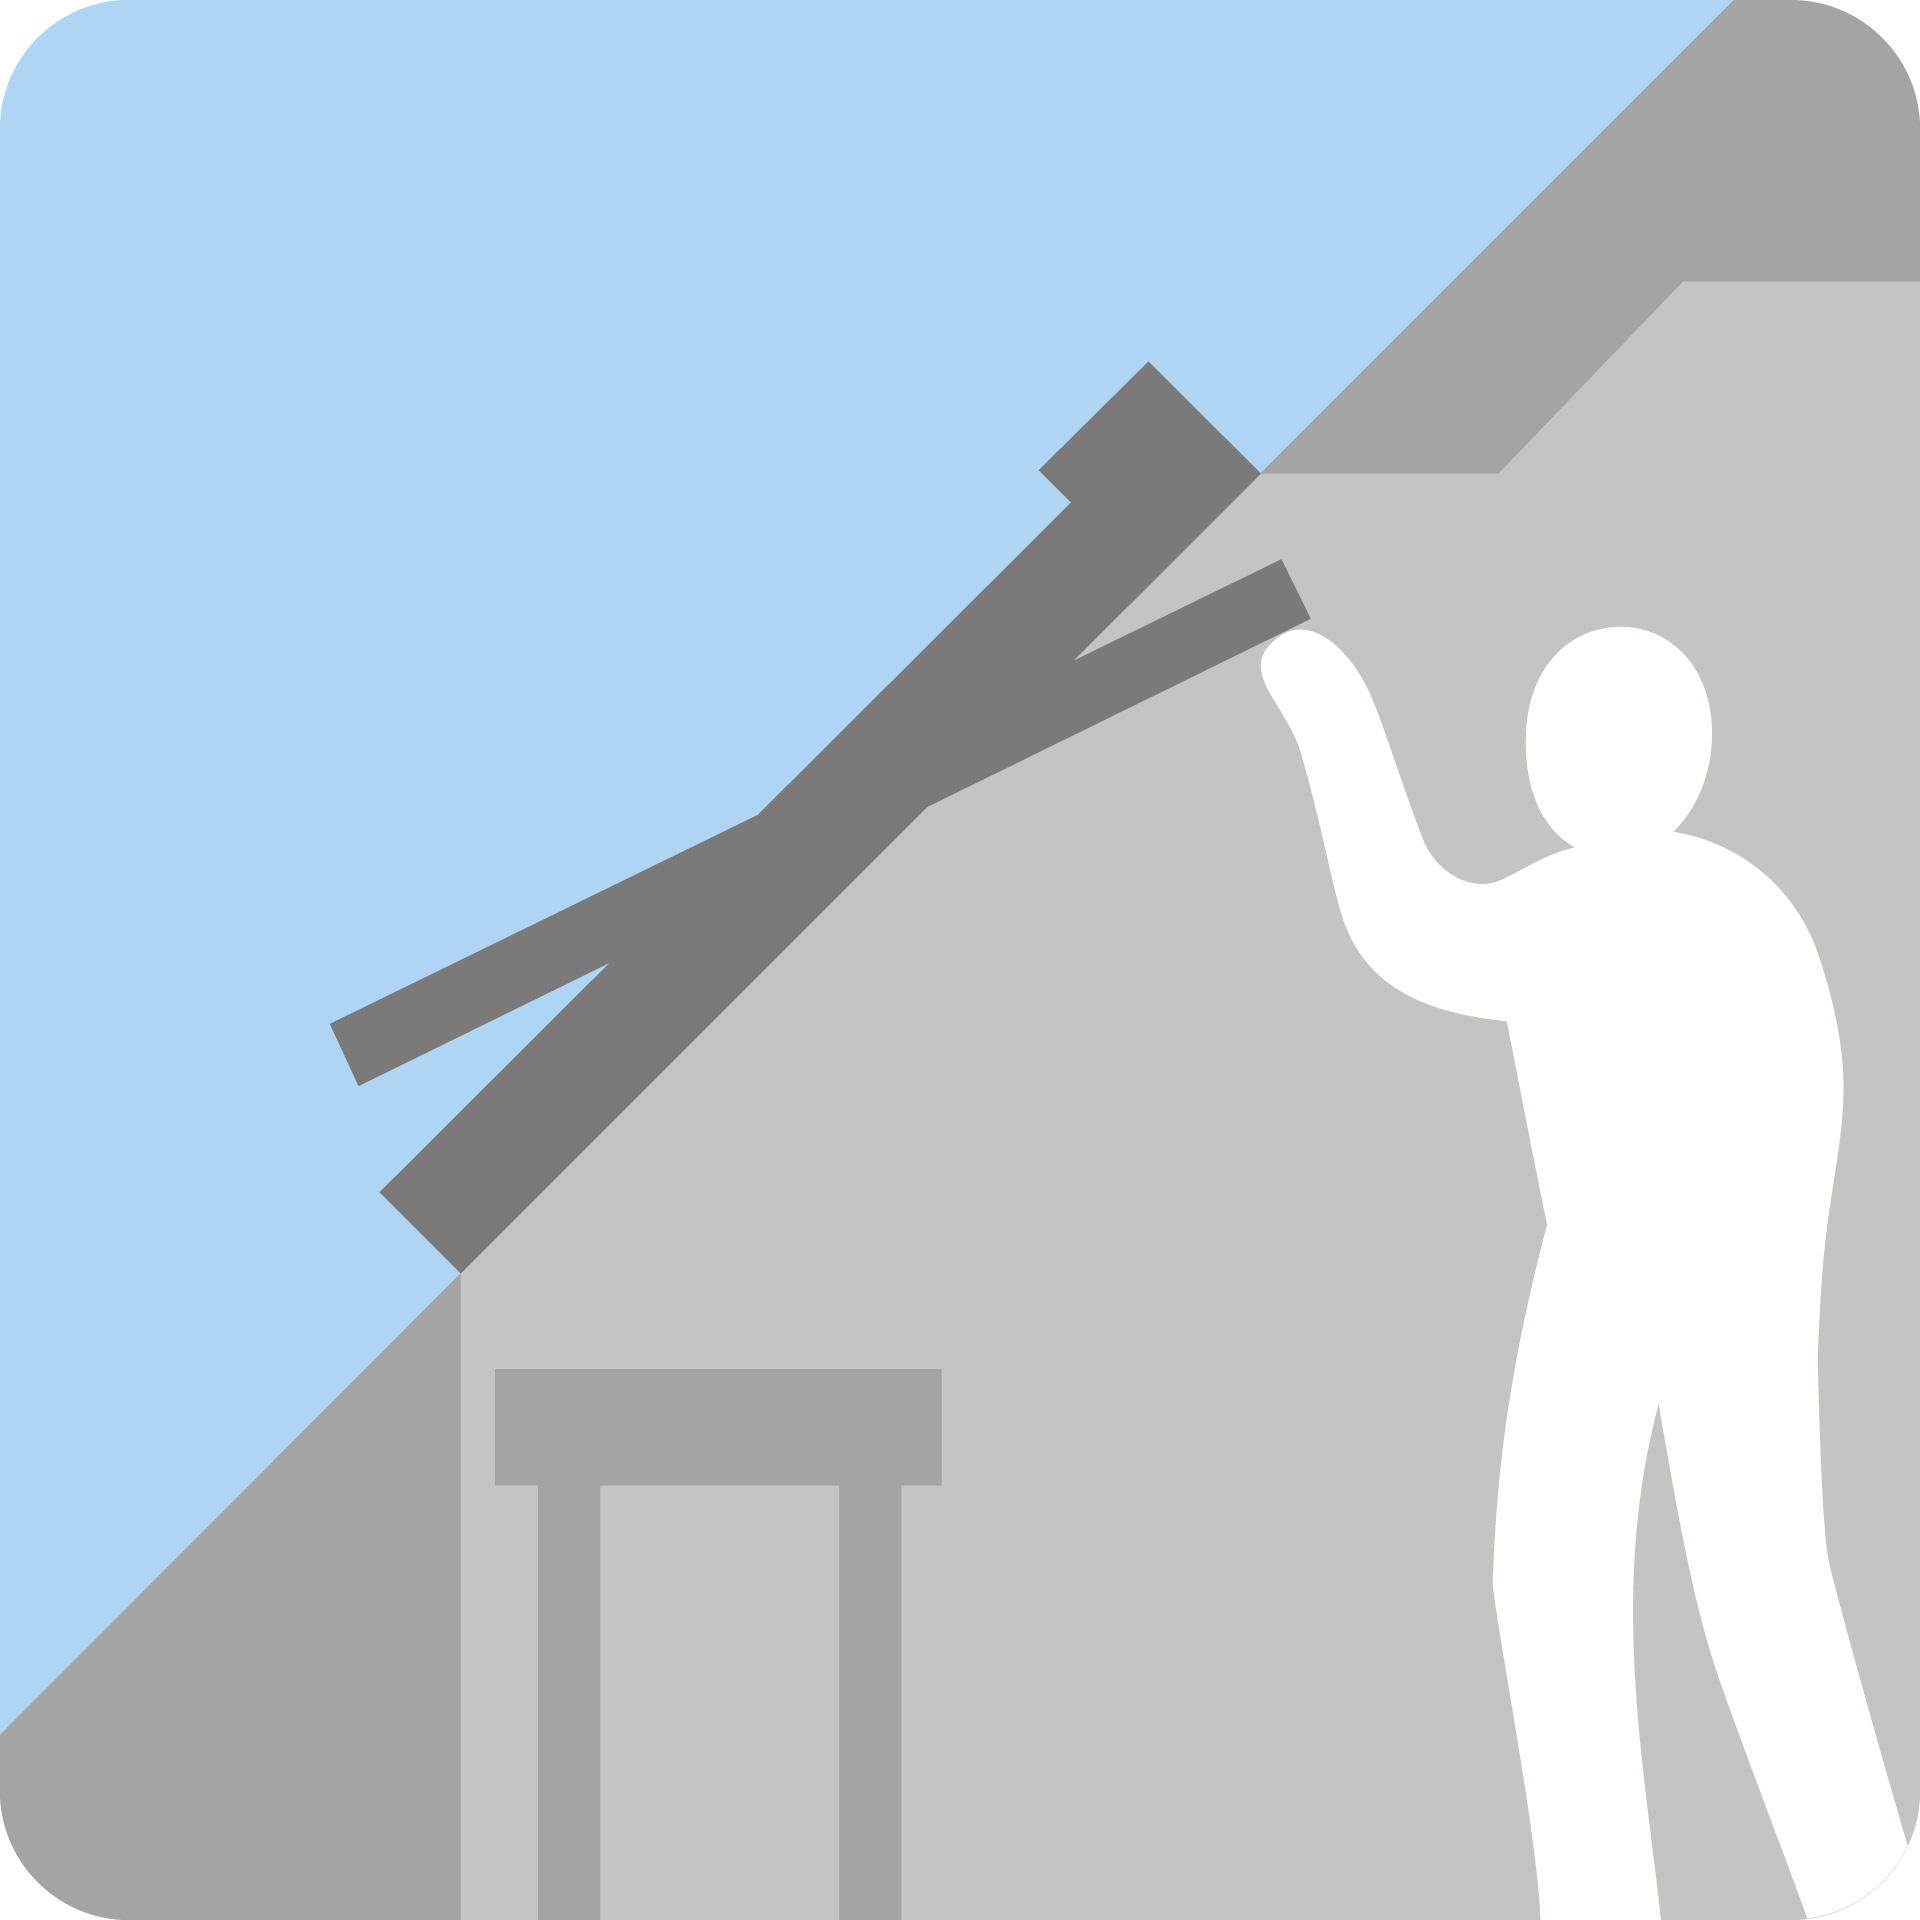 schwingfenster dachmax dachfenster shop velux fakro roto. Black Bedroom Furniture Sets. Home Design Ideas